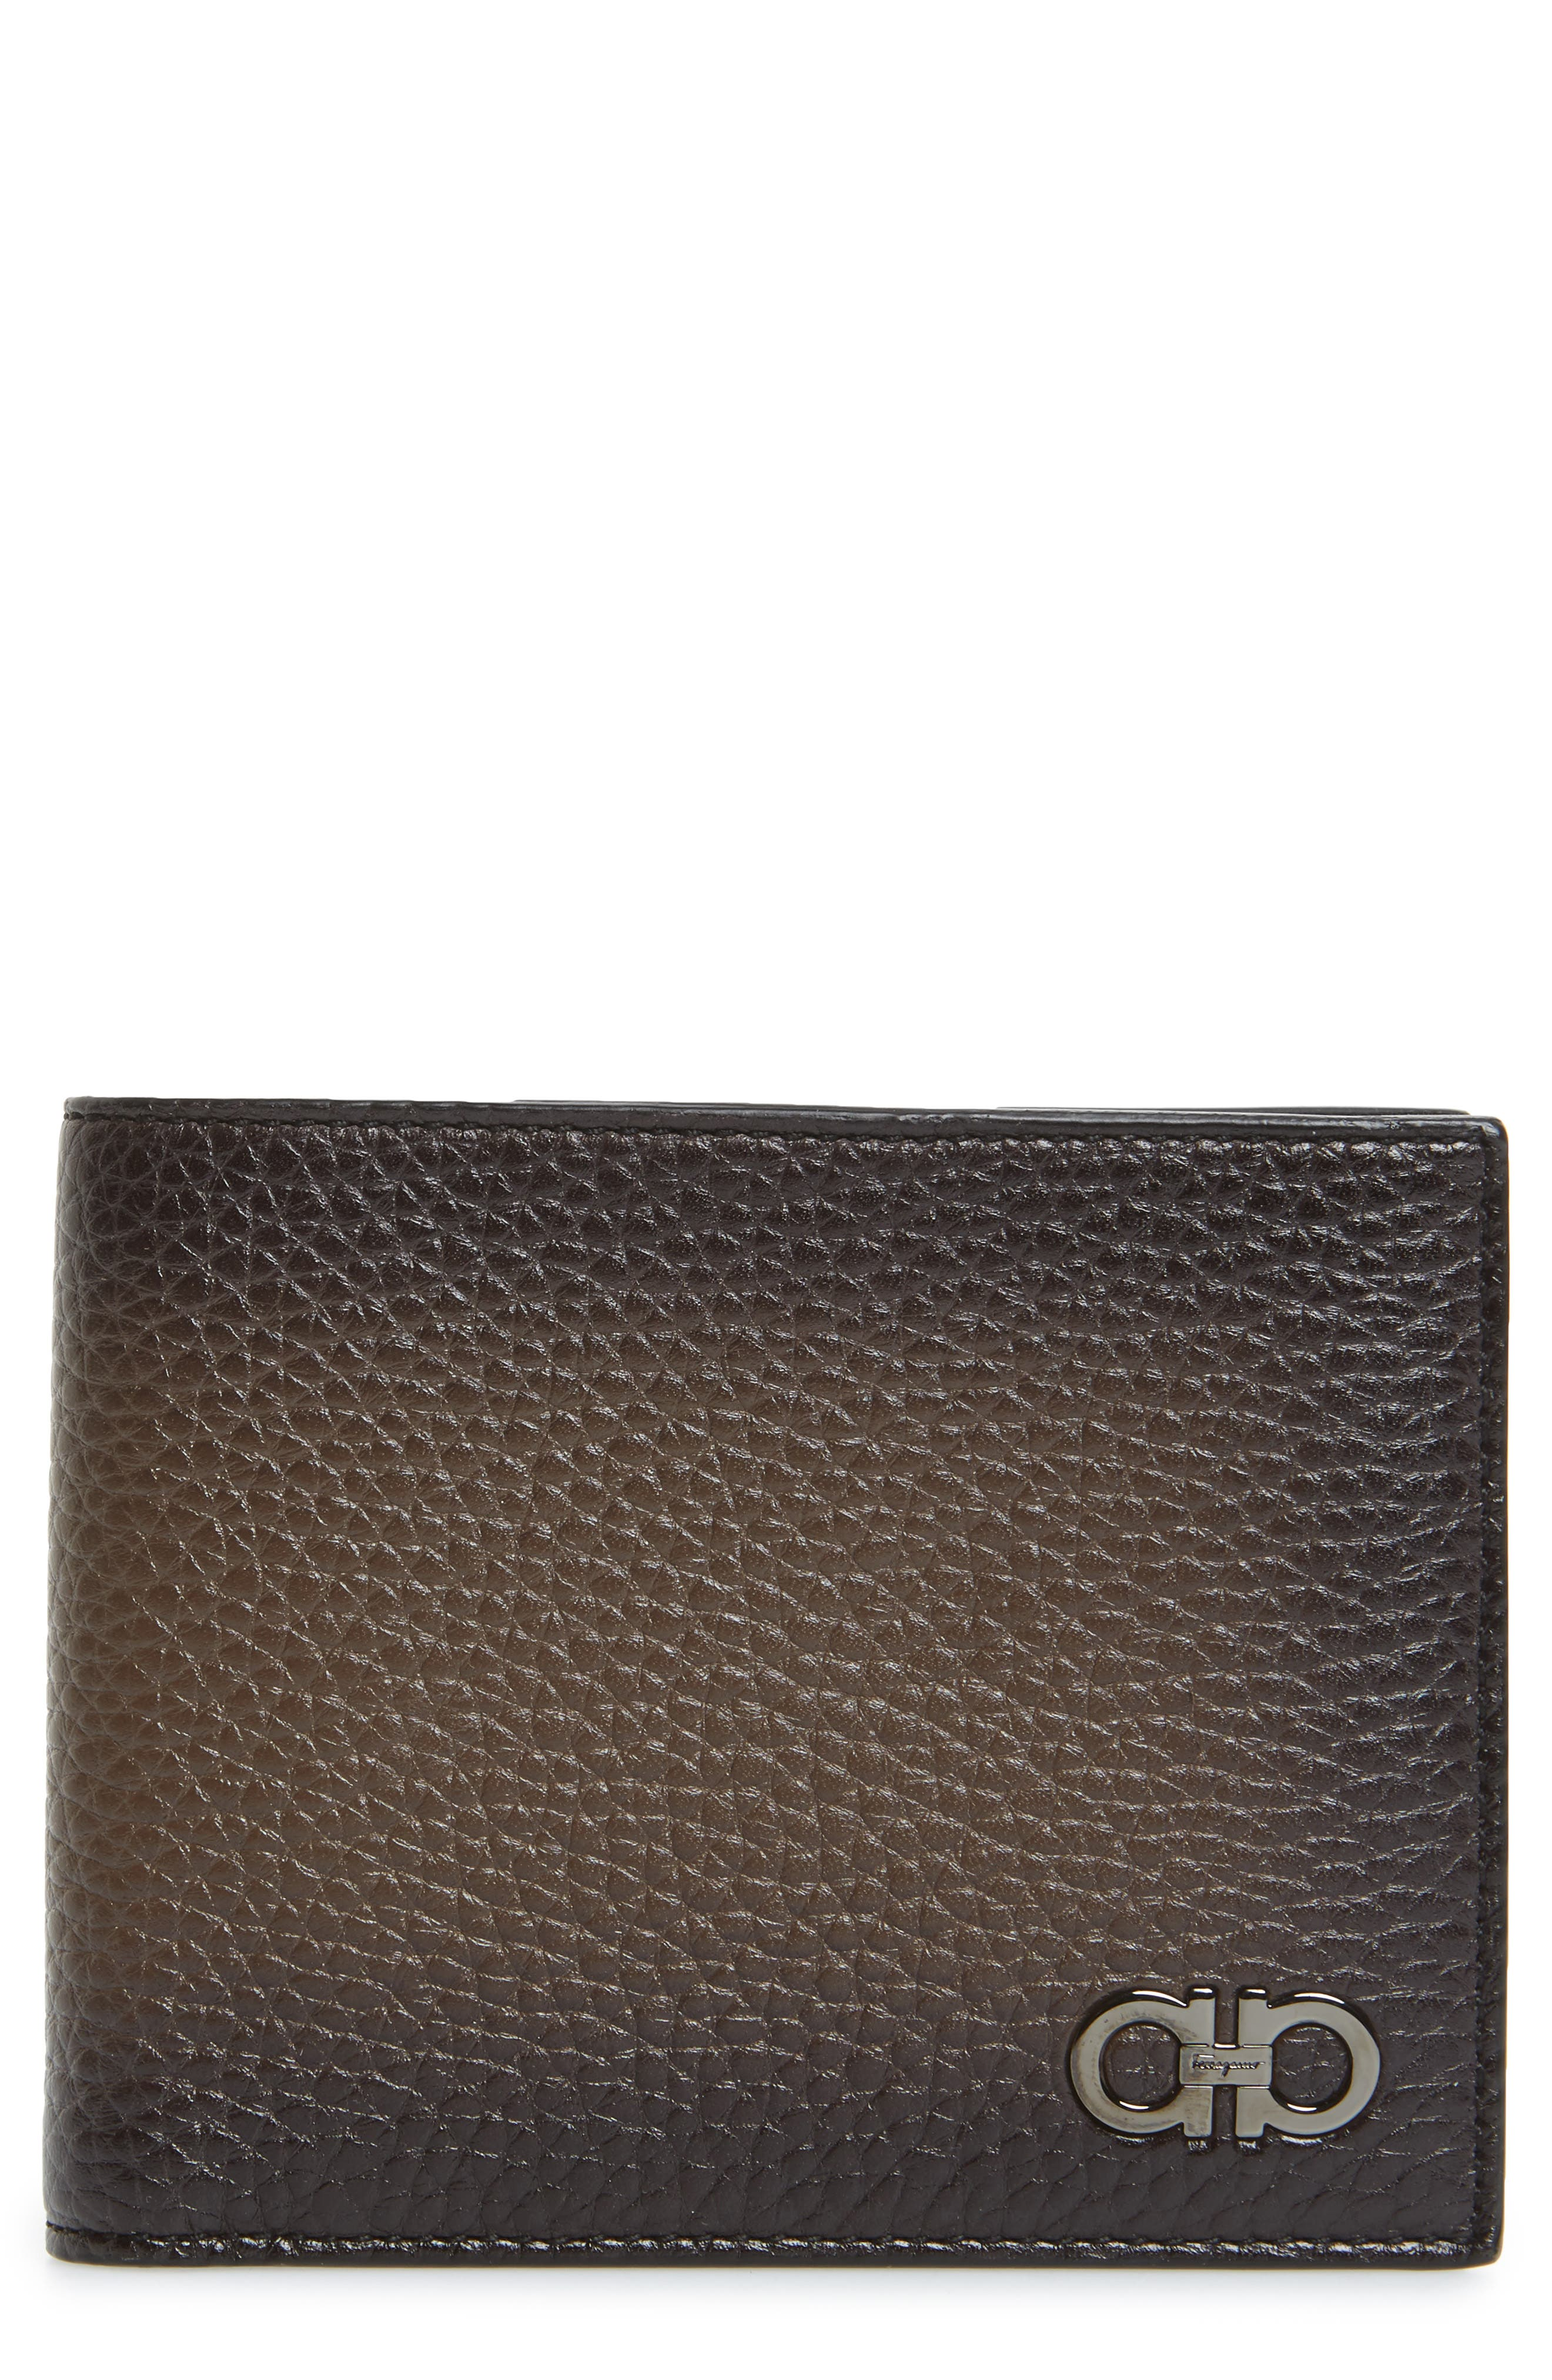 Alternate Image 1 Selected - Salvatore Ferragamo Glow Leather Wallet